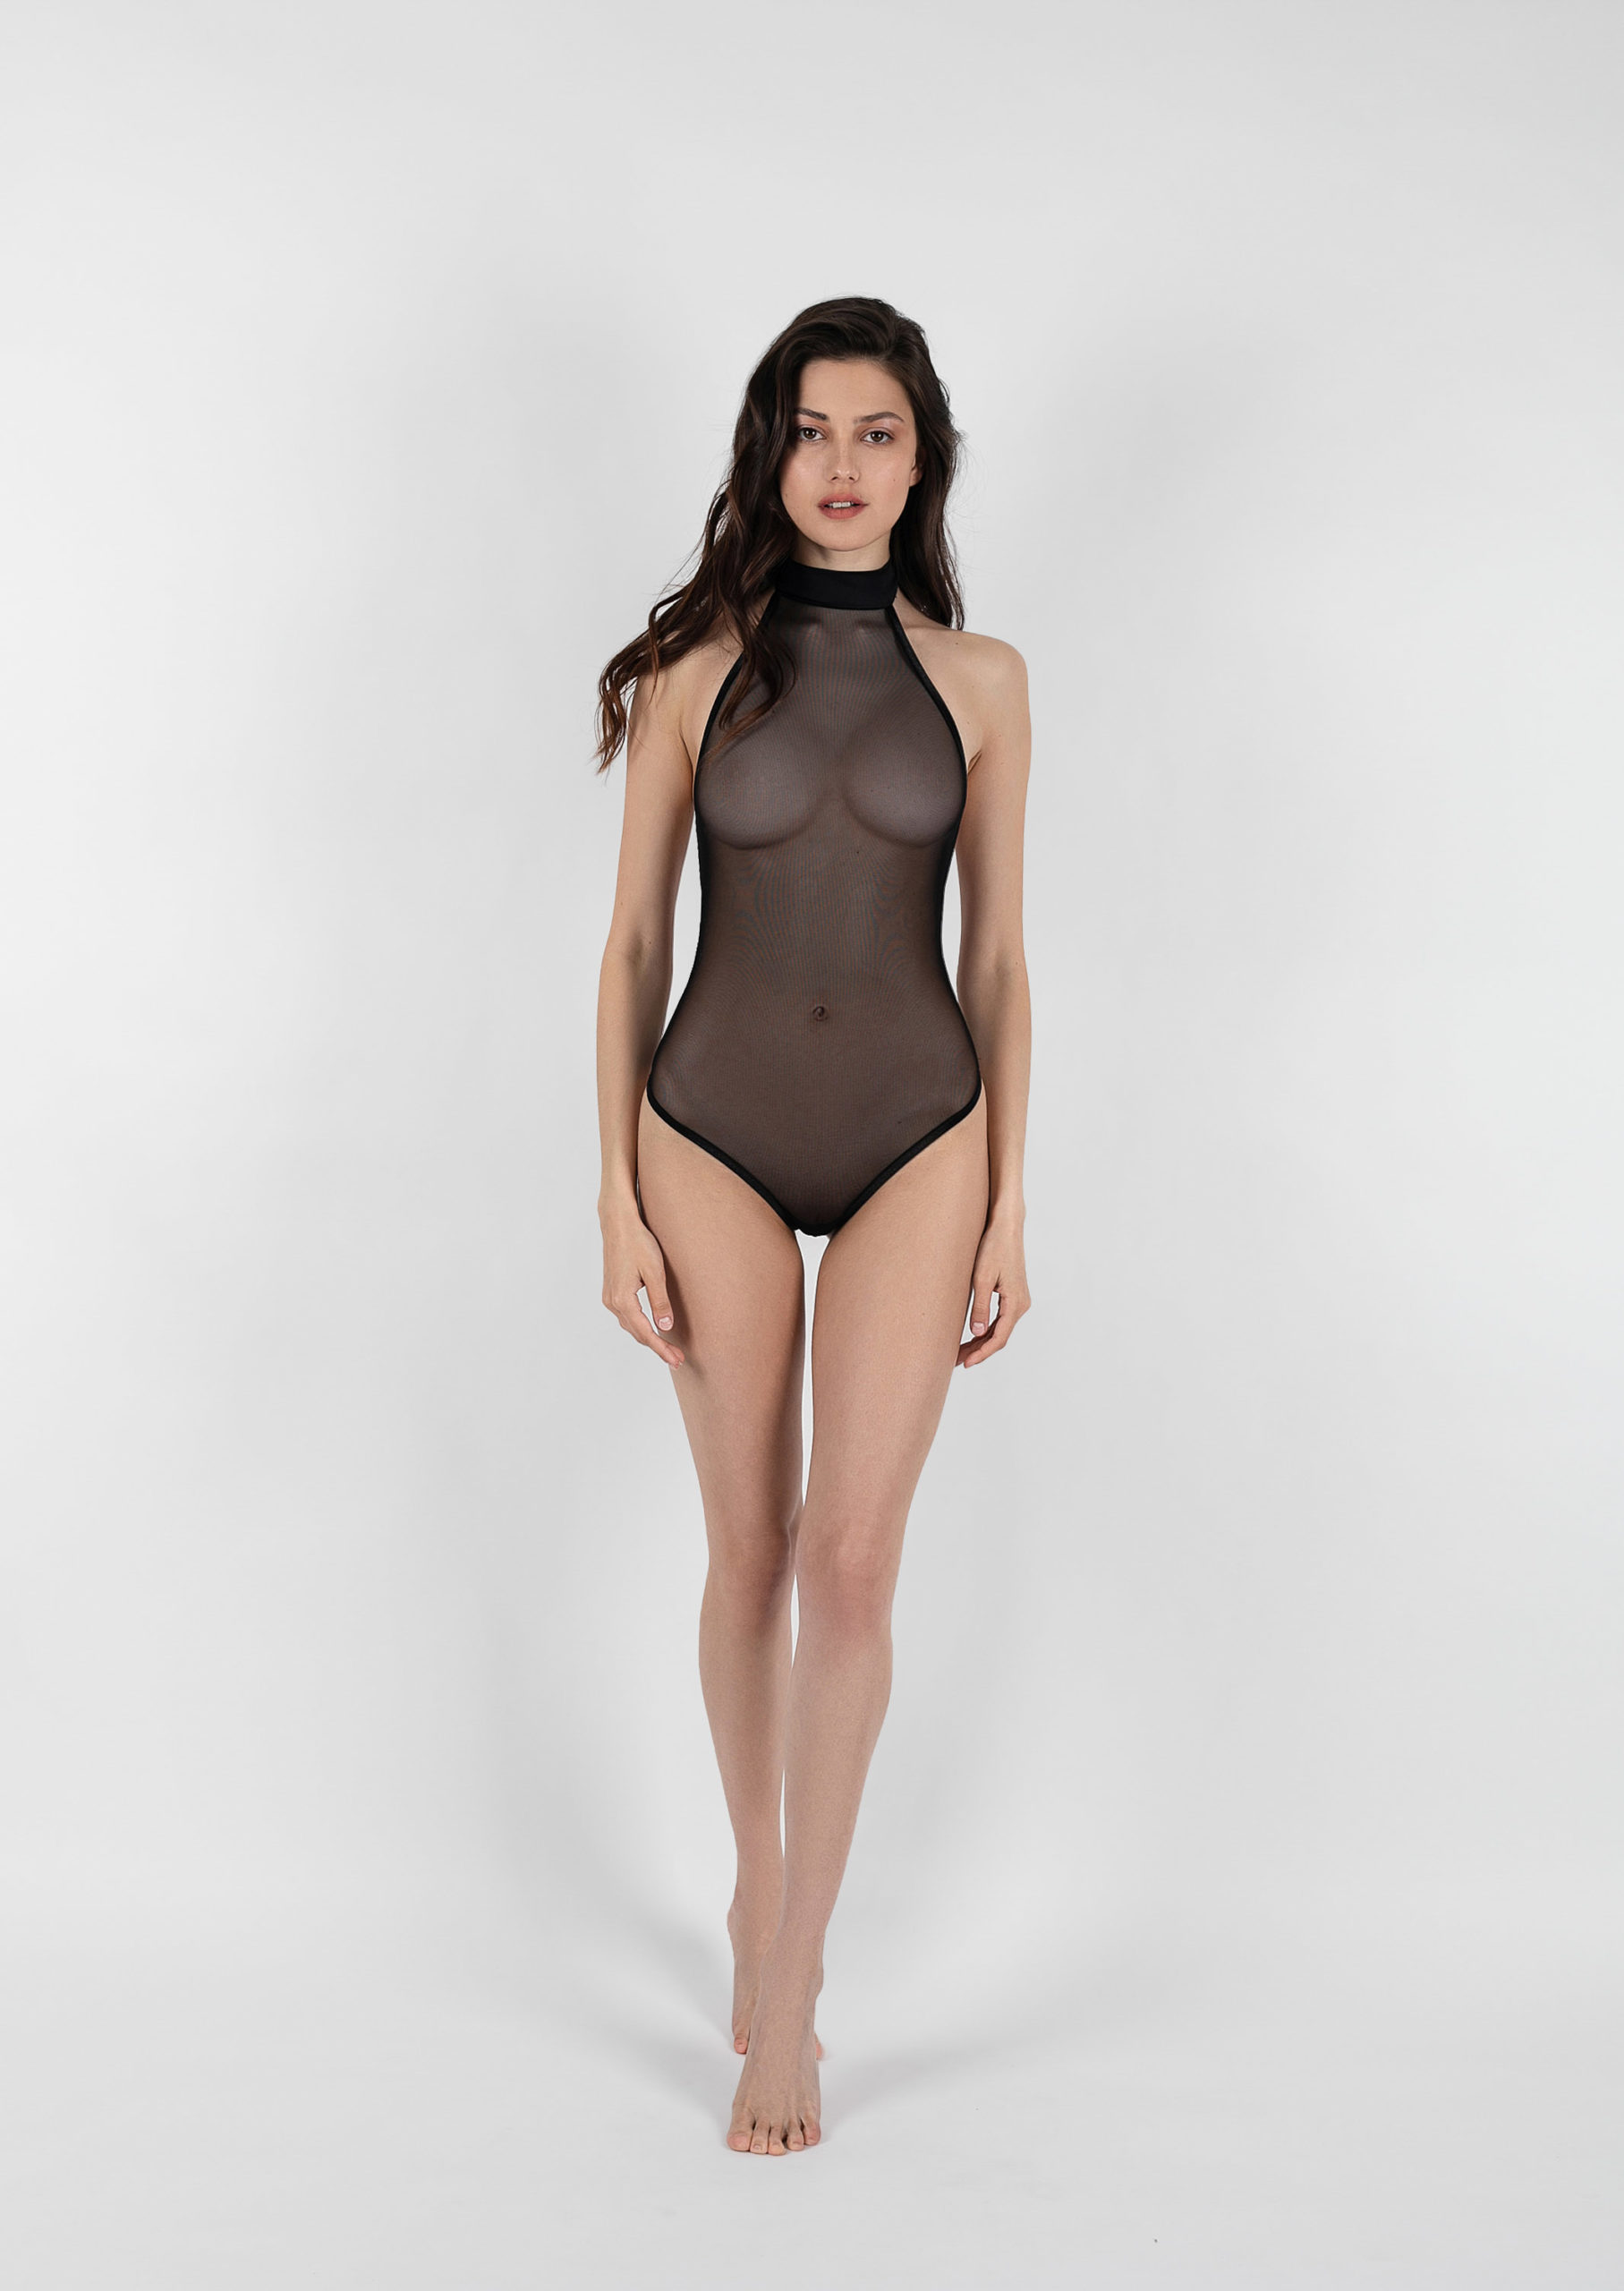 Solo body / black net bodysuit / sexy women's body / sheer black sleeveless bodysuit / clear transparemt body / erotic lingerie